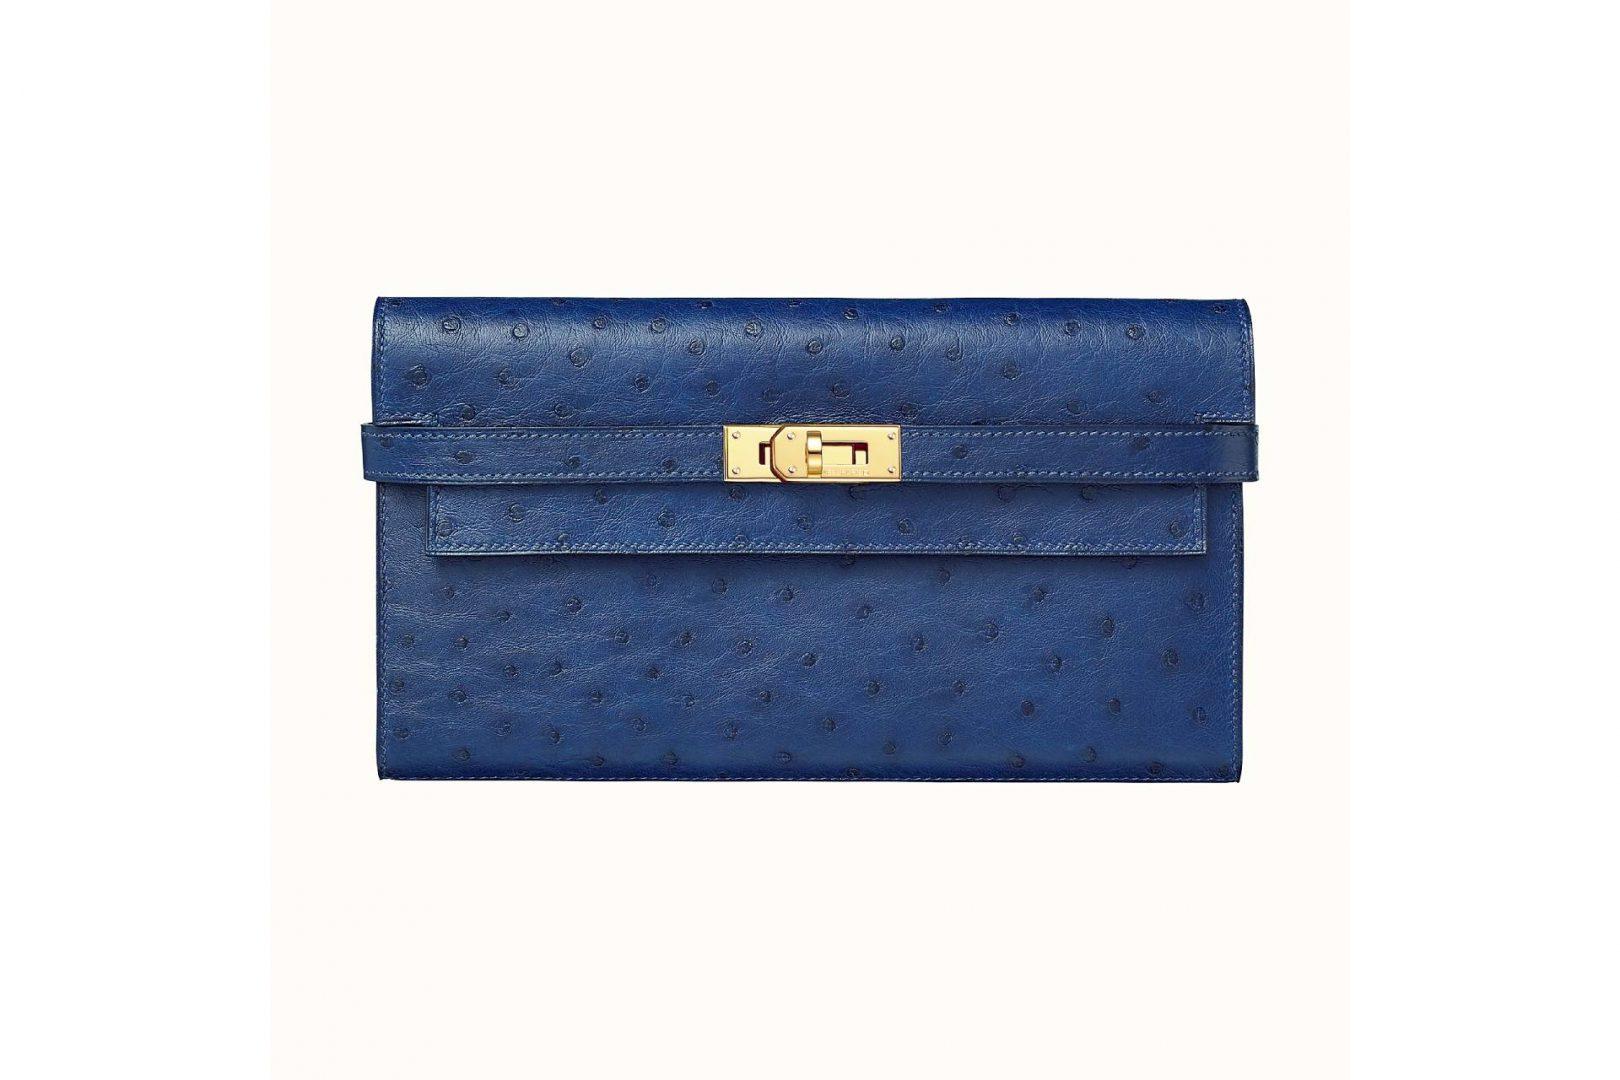 Hermès Kelly Classic wallet, Bleu Iris.